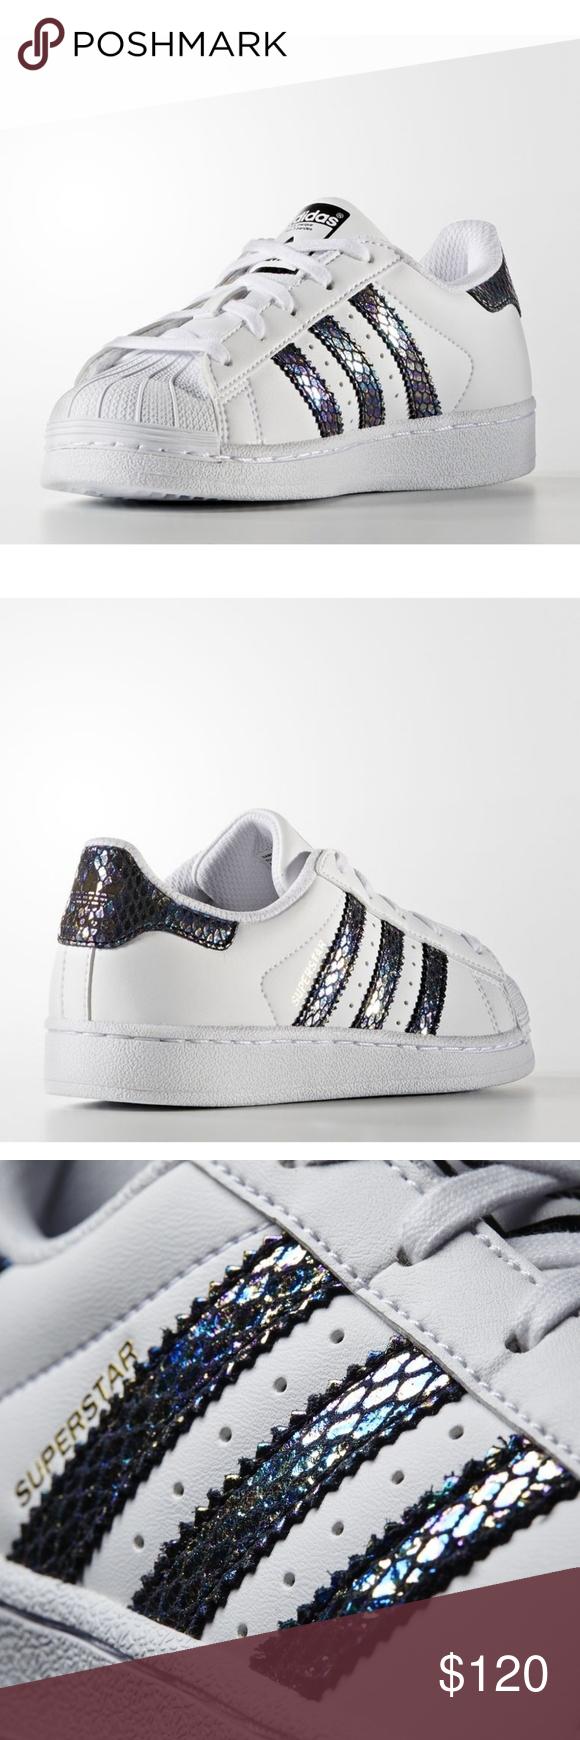 Adidas Originals Superstar Metallic